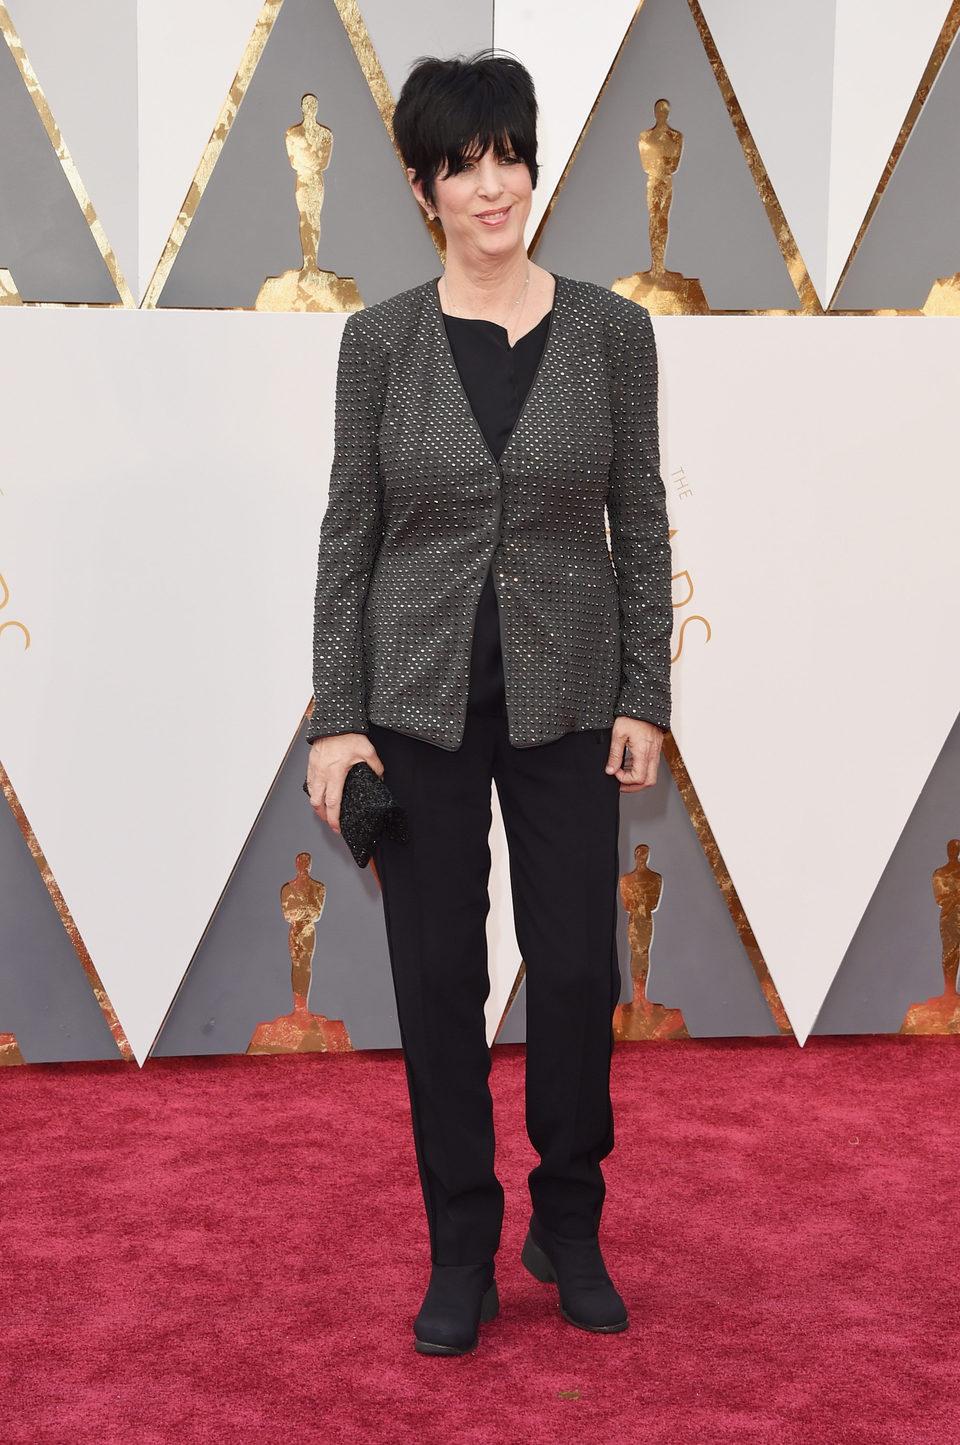 Diane Warren at the Oscars 2016 red carpet